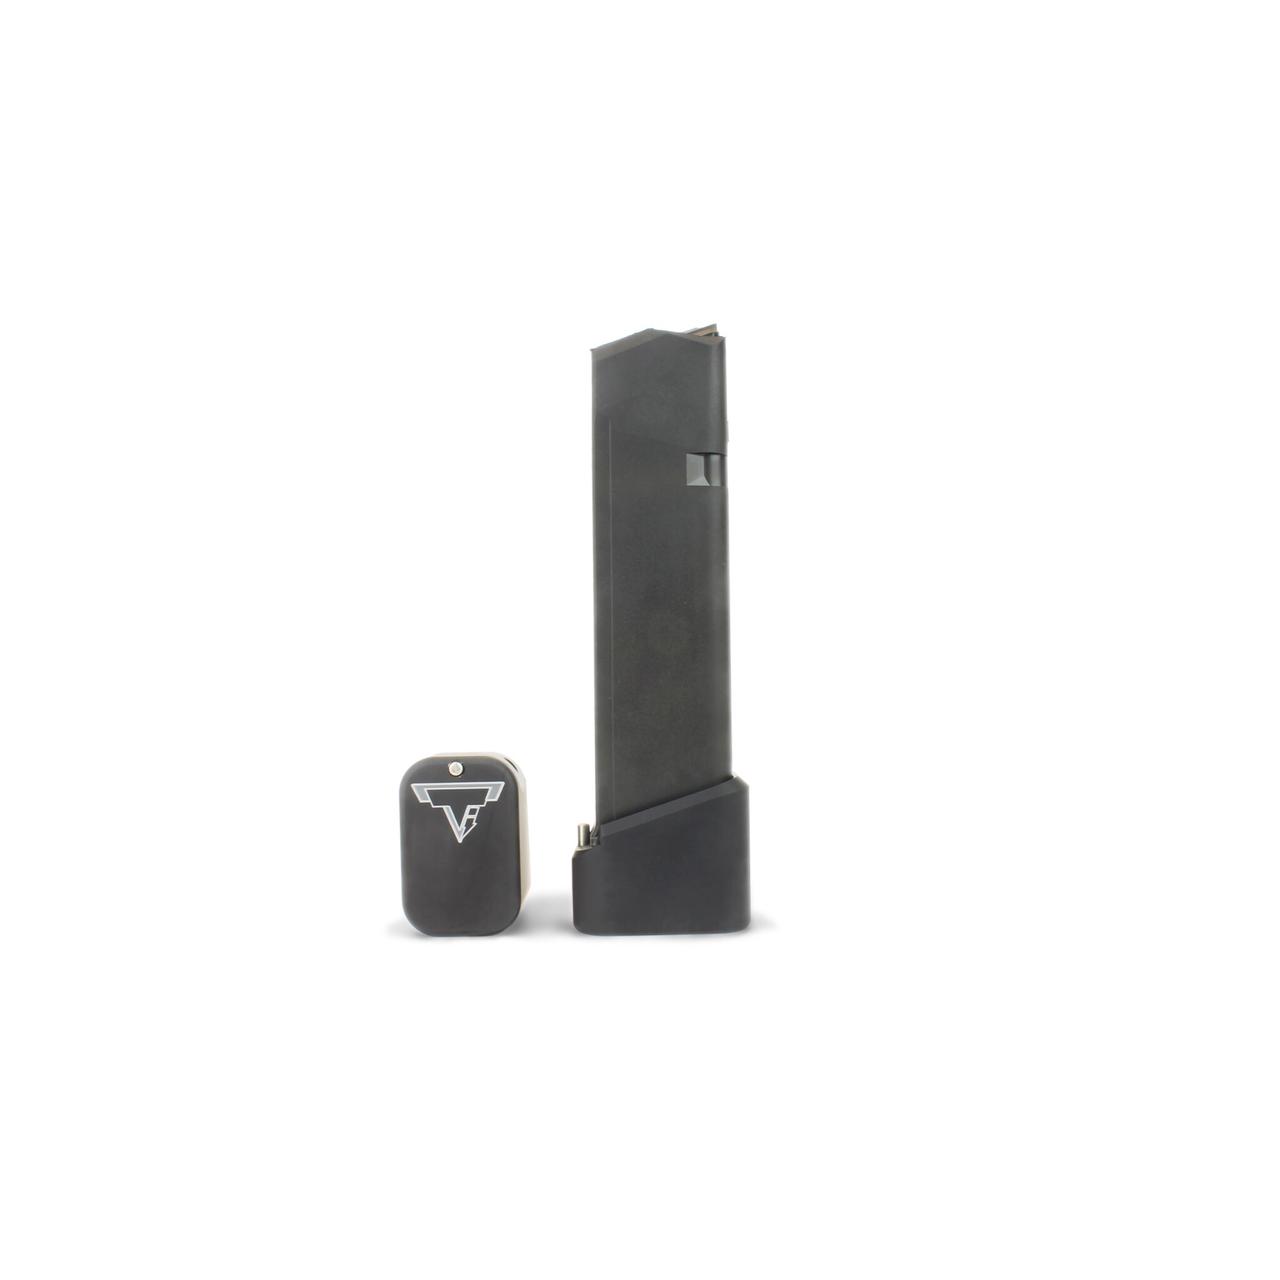 Taran Tactical +5/6 Base Pad Kit for Standard Sized Glocks 9/40 - Flat Black